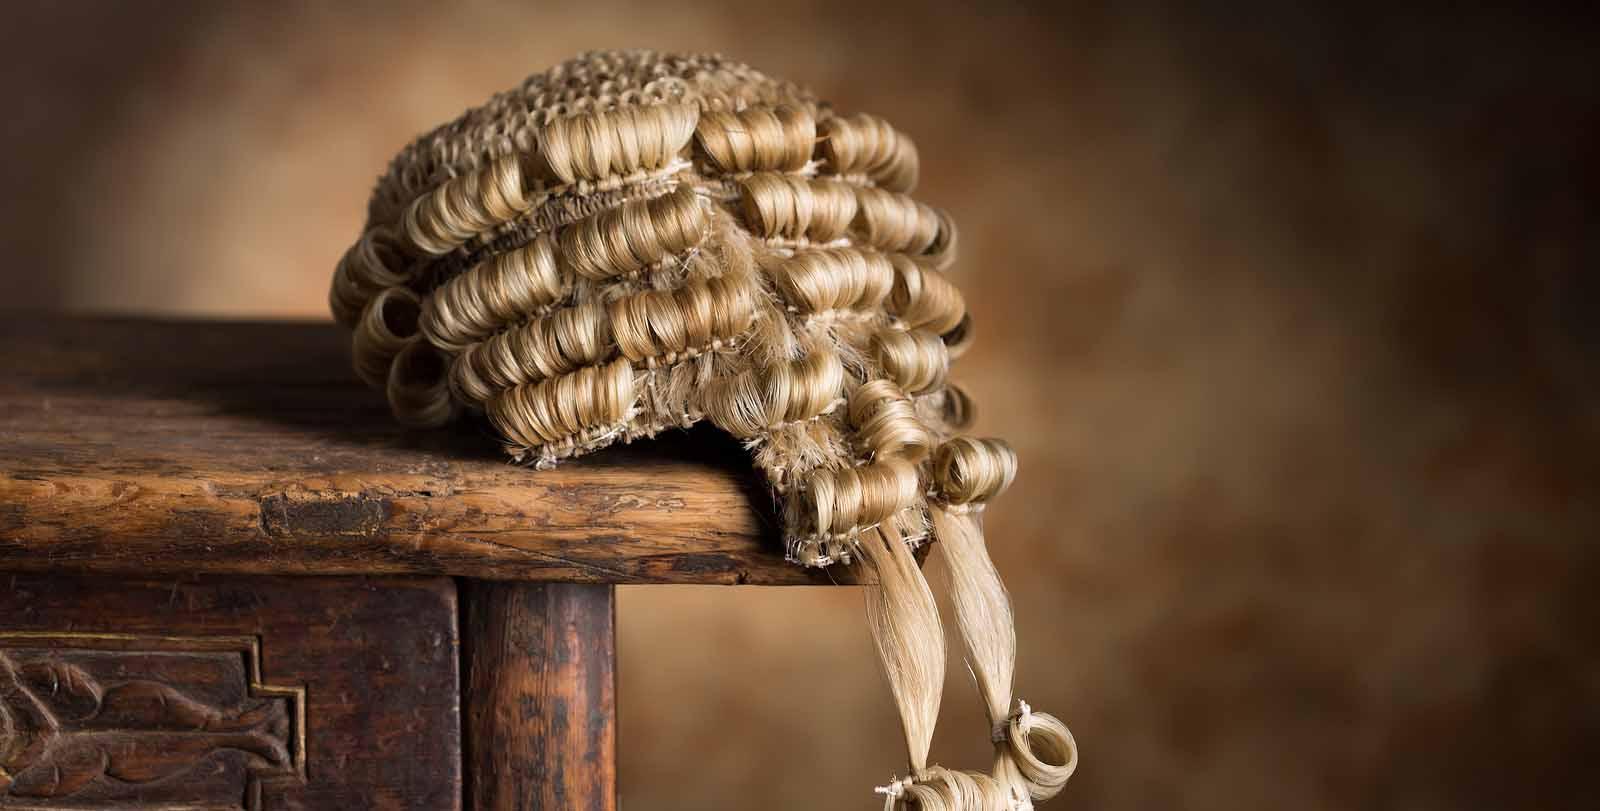 Offenders Described as 'Leaders' by Judge